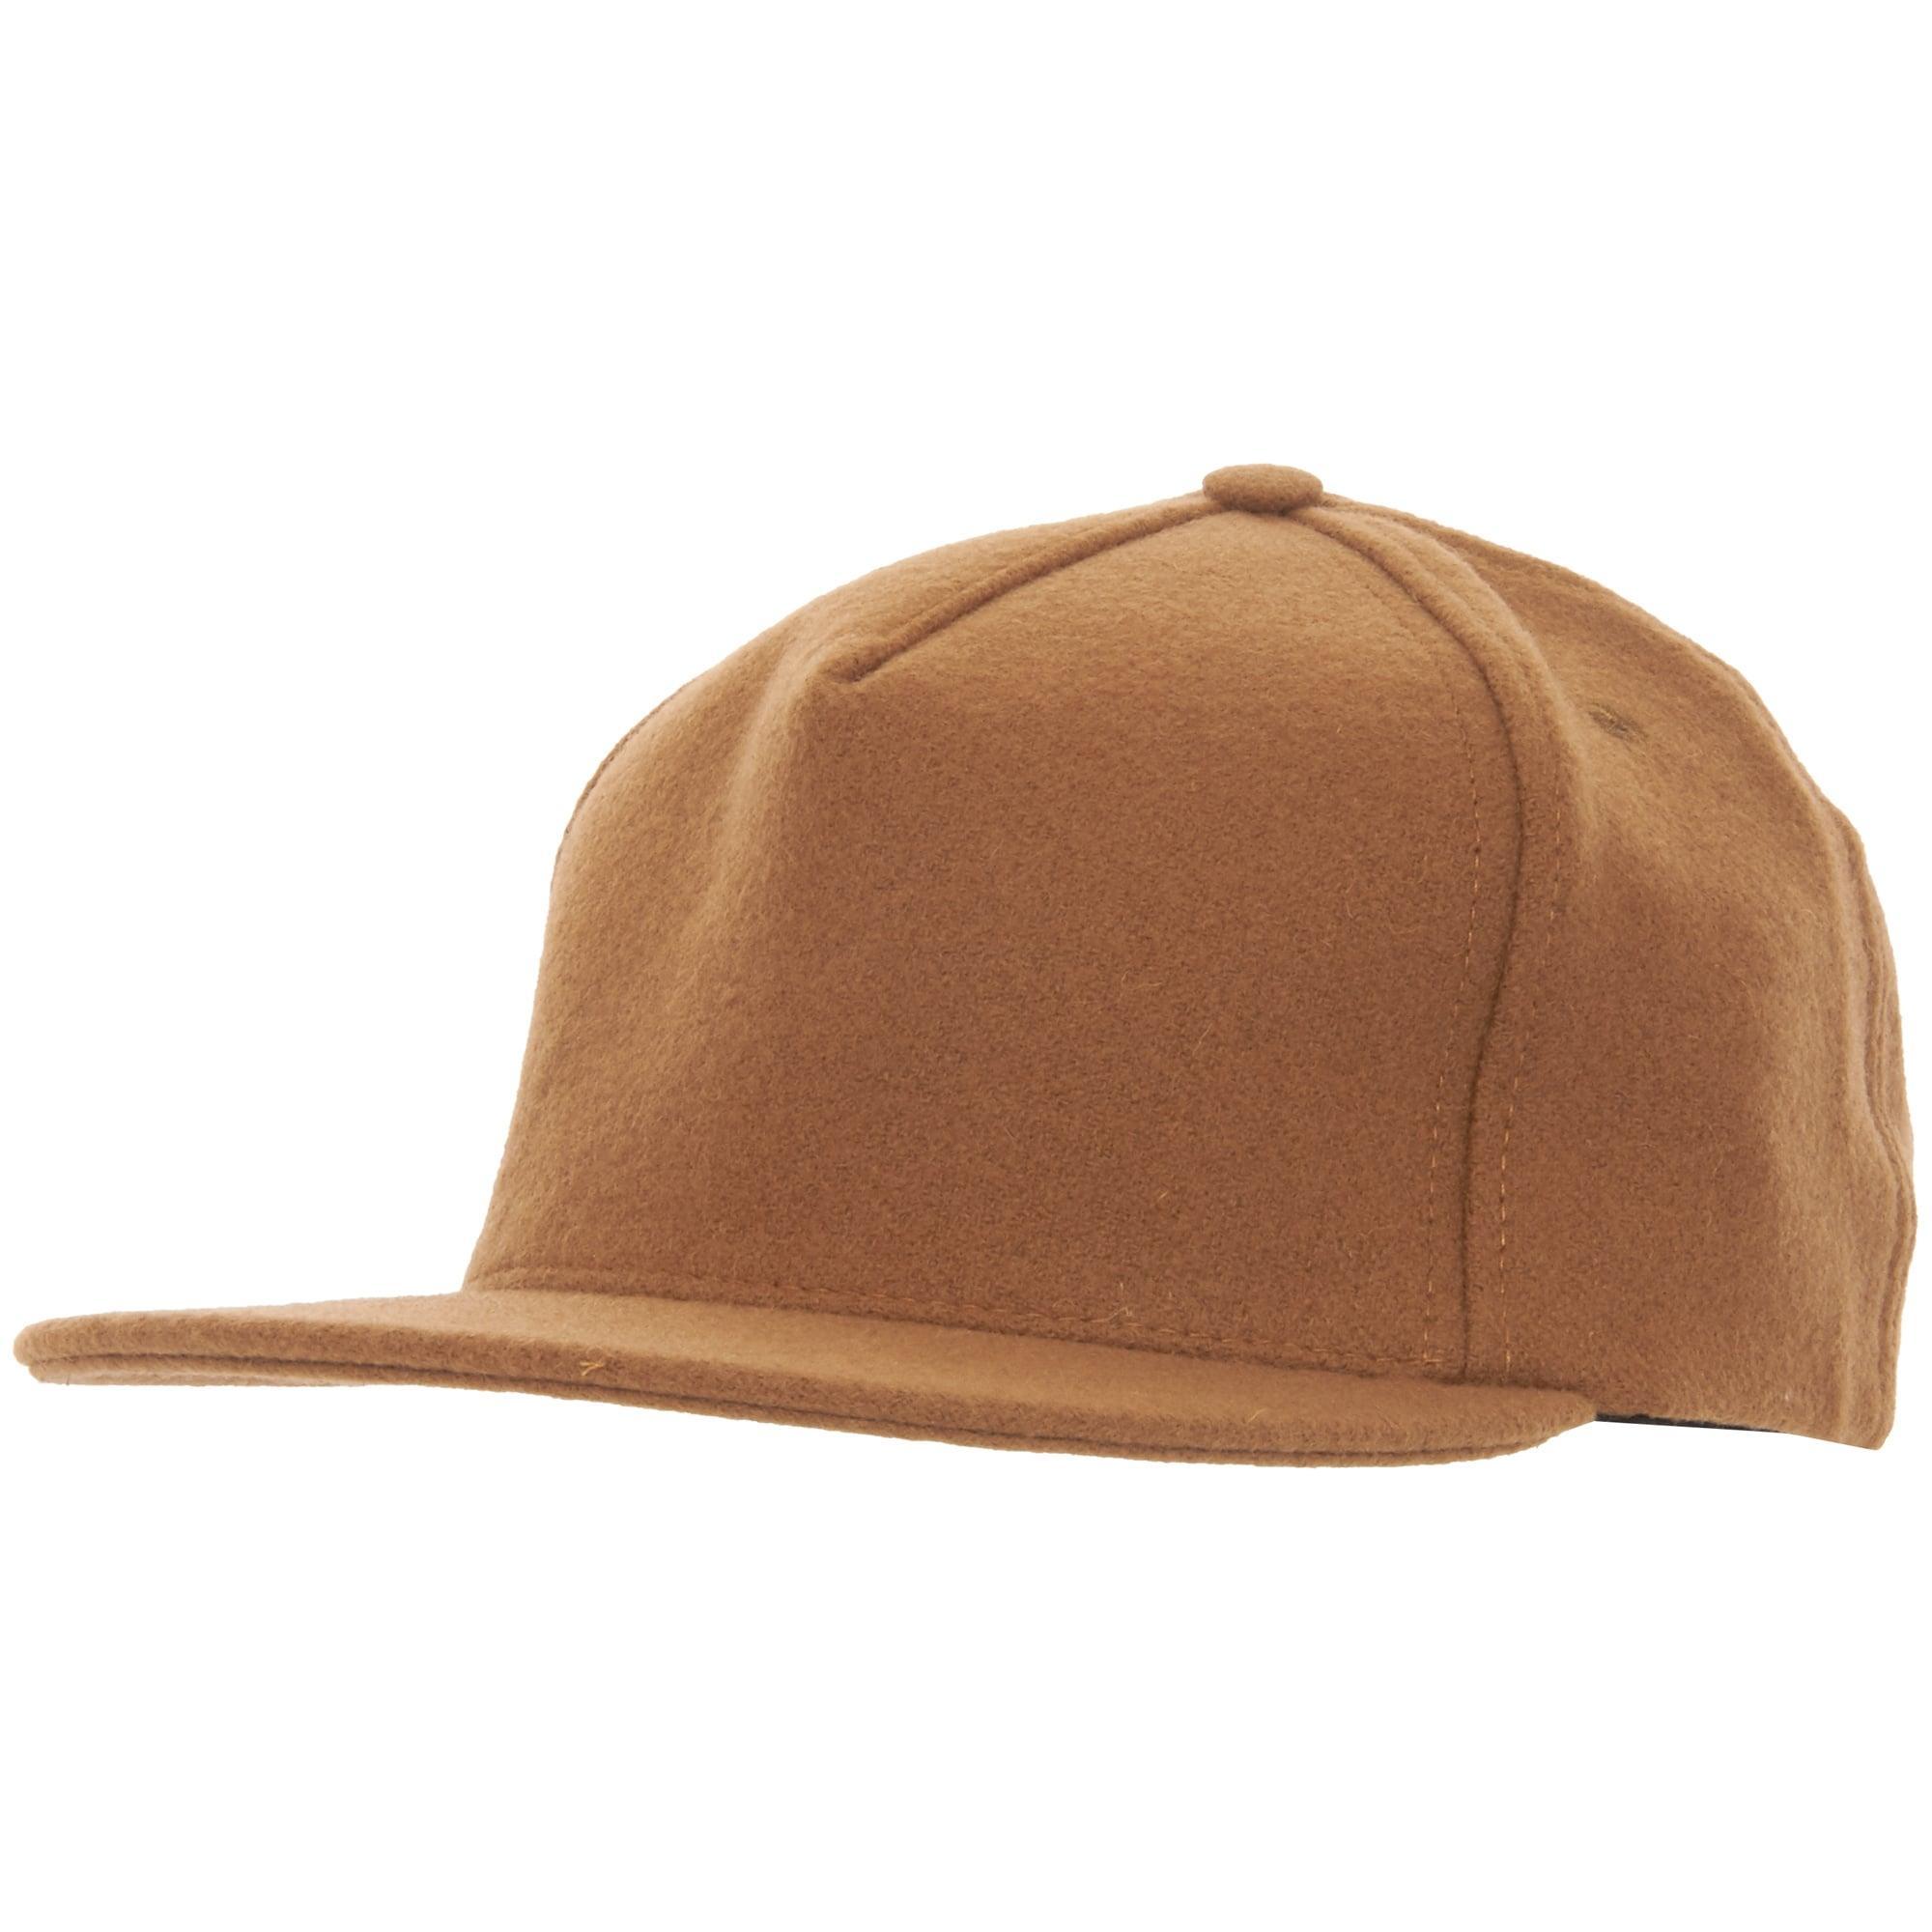 b2092dab9b9 Lyst - Universal Works Melton Baseball Hat in Brown for Men